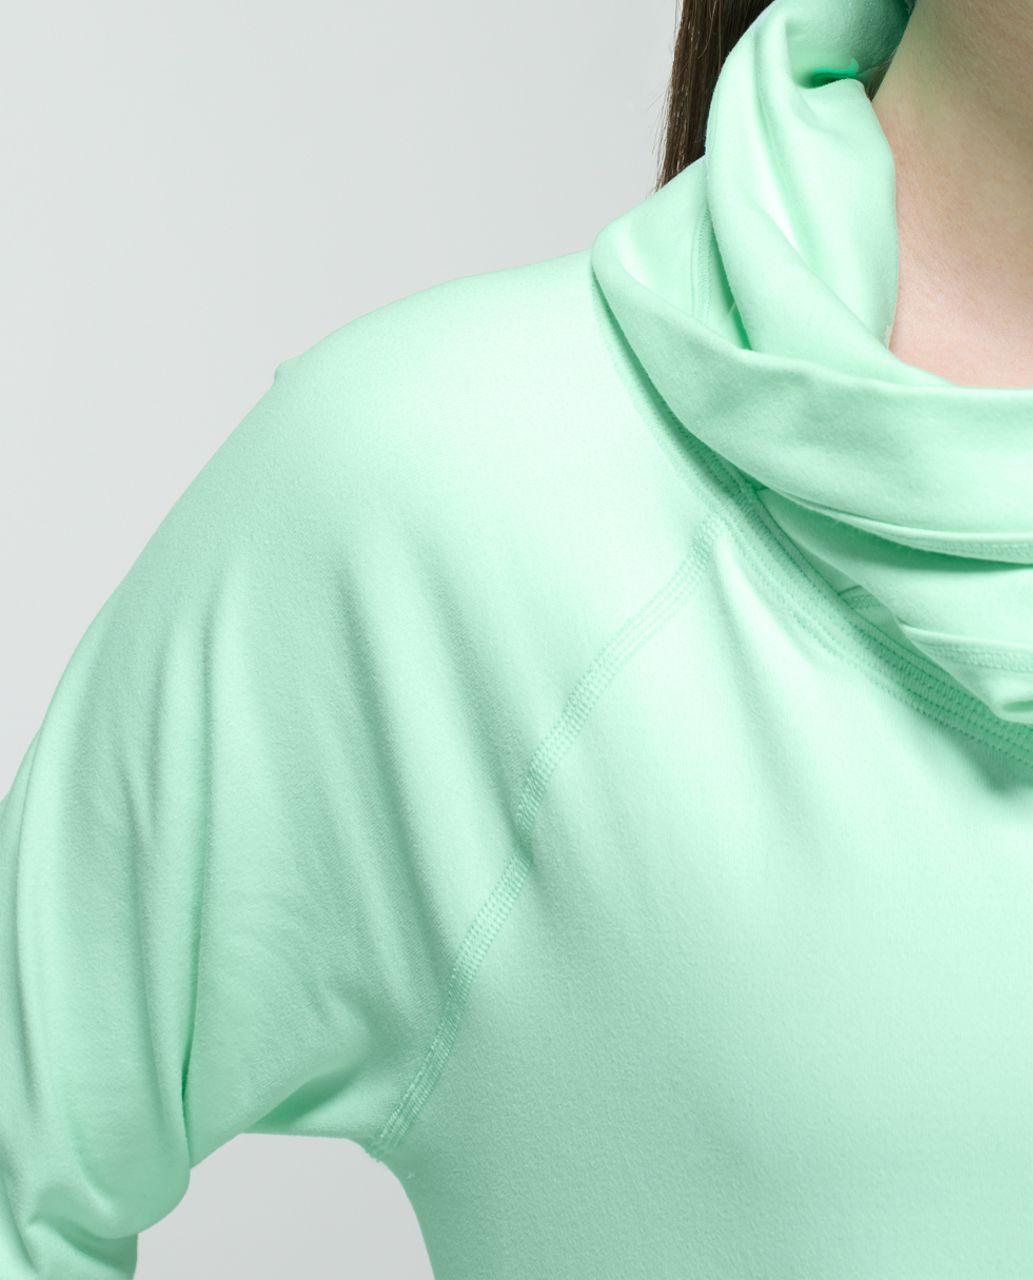 Lululemon Healthy Heart Pullover - Fresh Teal